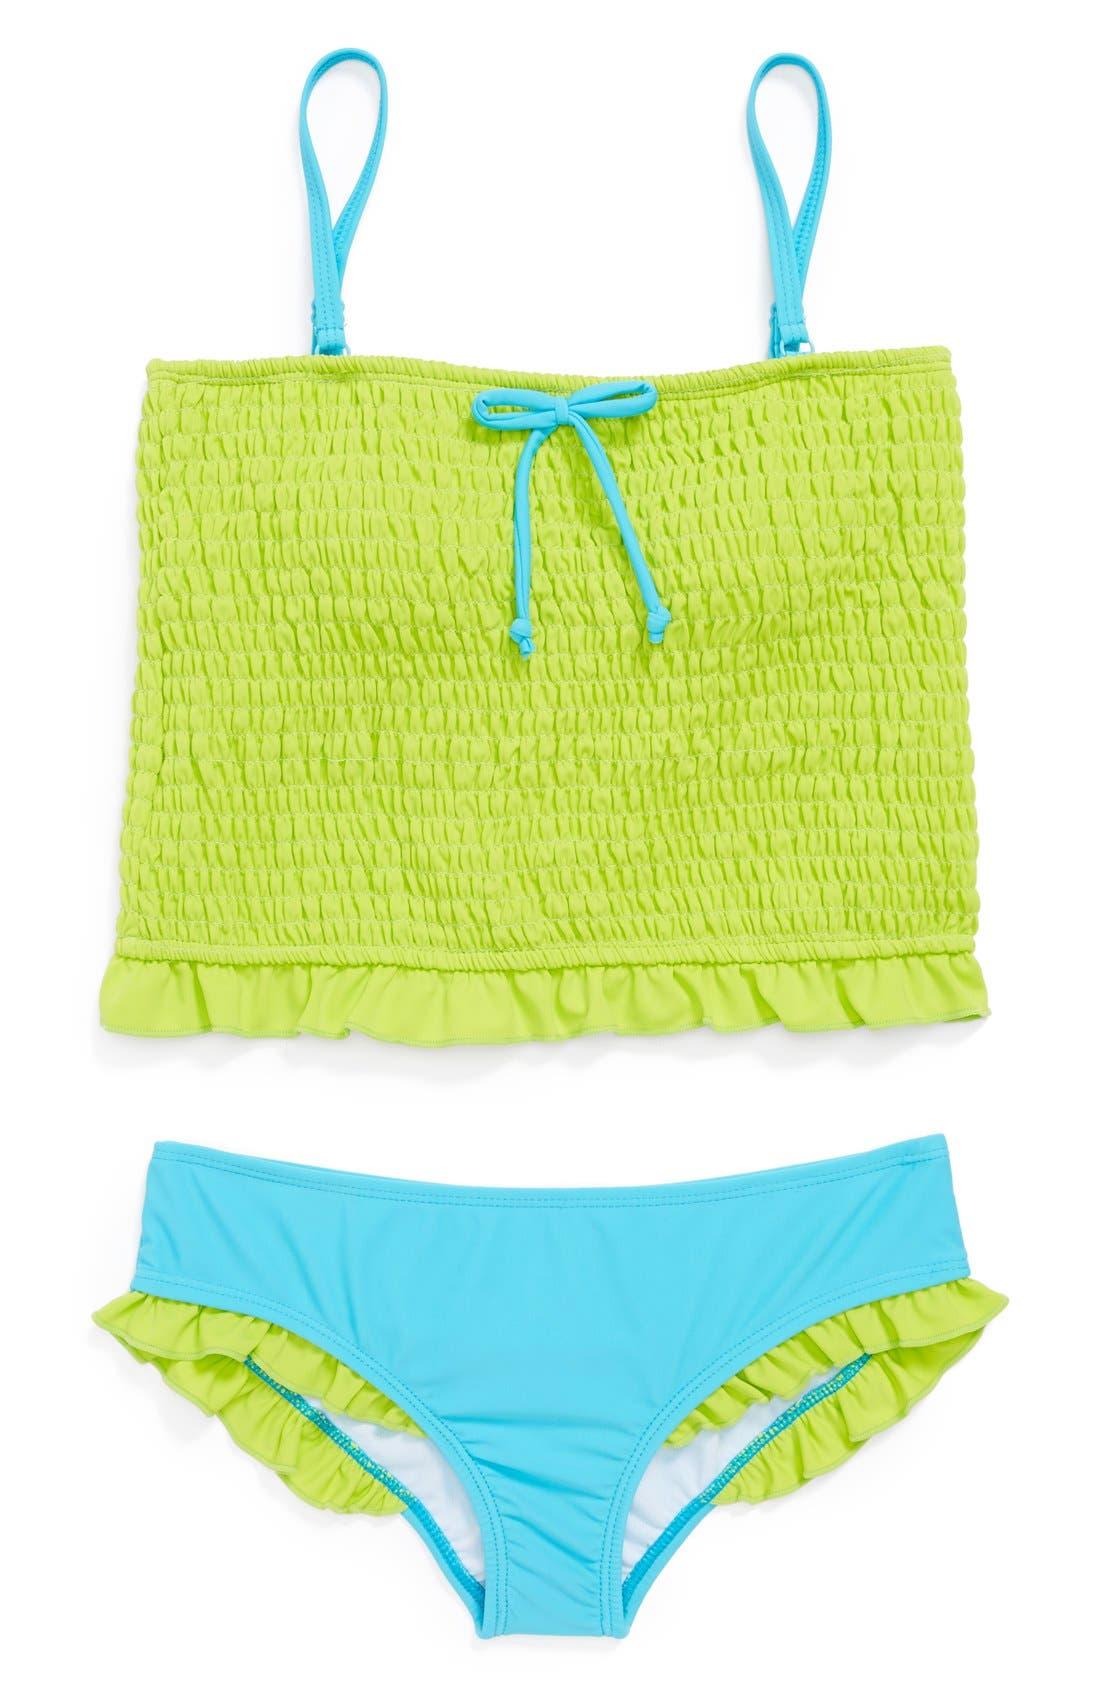 Alternate Image 1 Selected - Limeapple 'Splash' Two-Piece Tankini Swimsuit (Big Girls)